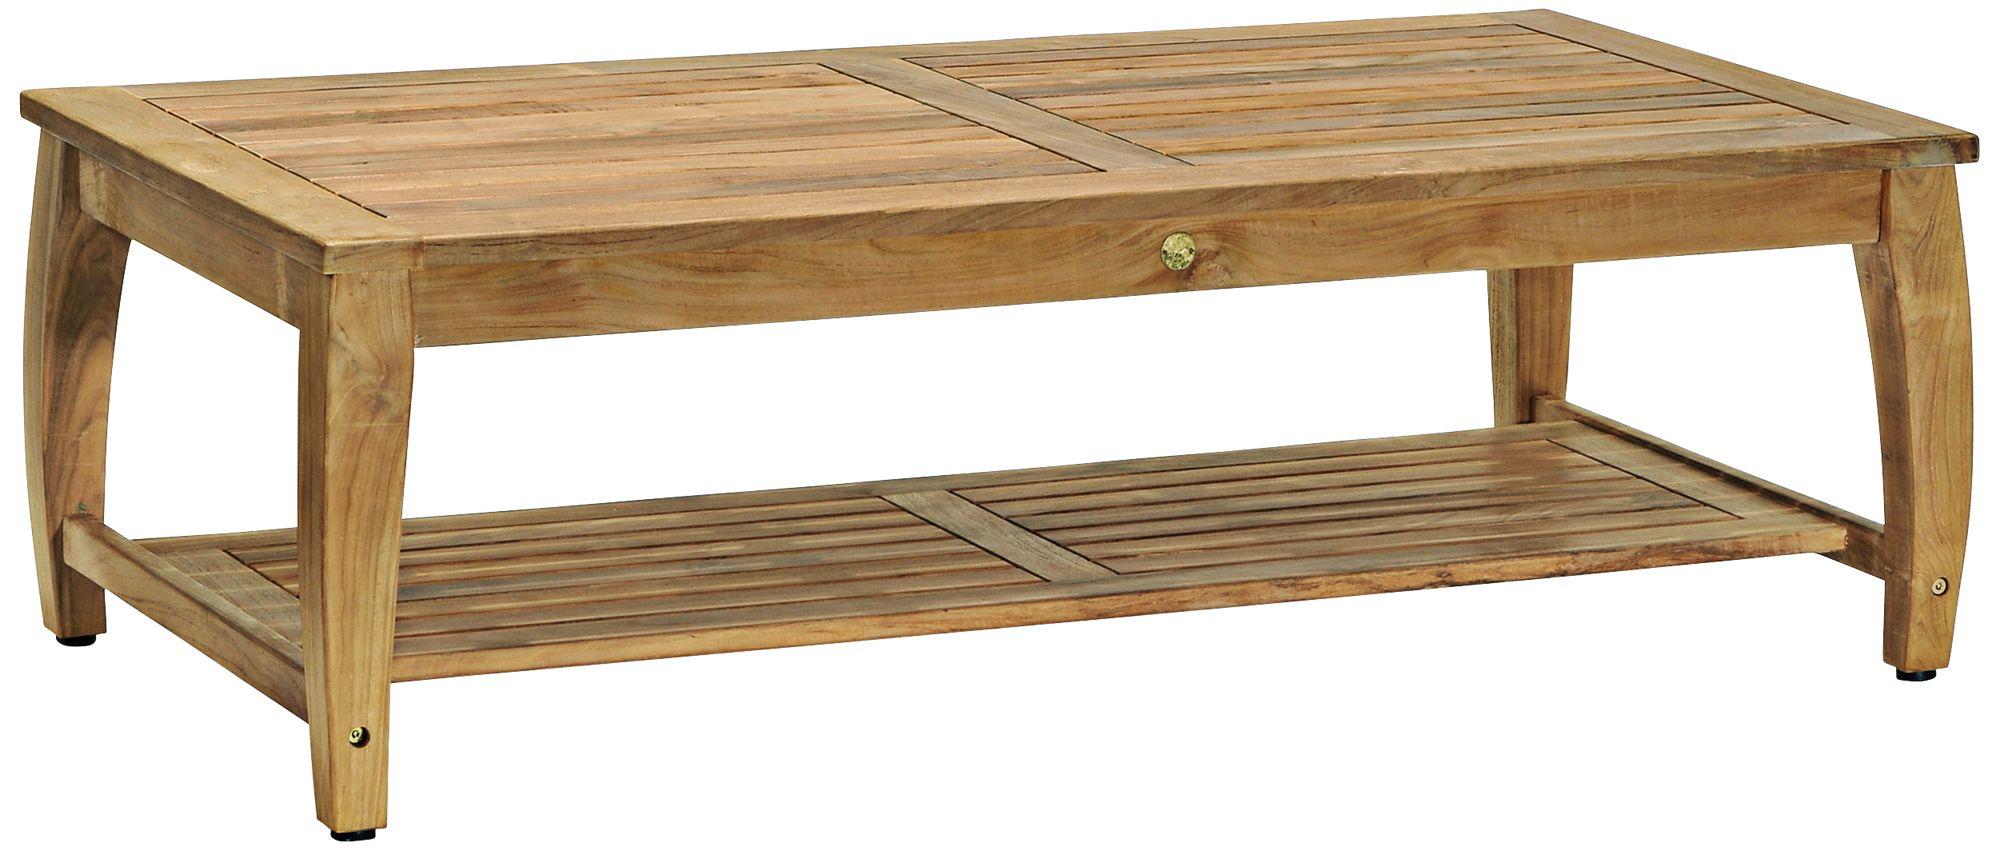 Woodbury Rectangular Natural Teak Wood Coffee Table